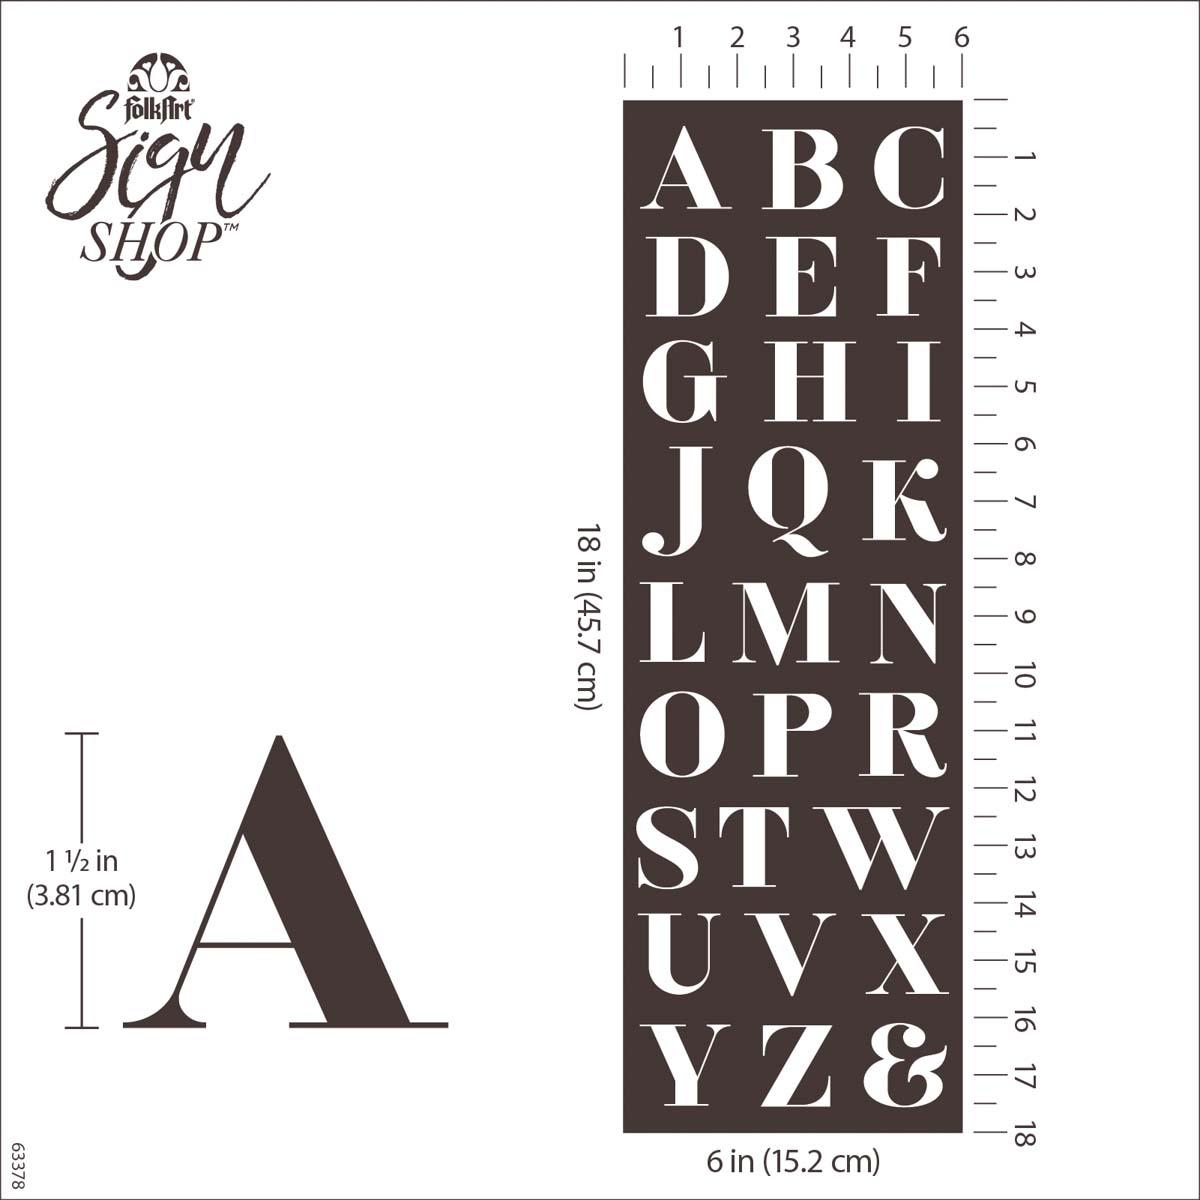 FolkArt ® Sign Shop™ Mesh Stencil - Serif Letters - 63378